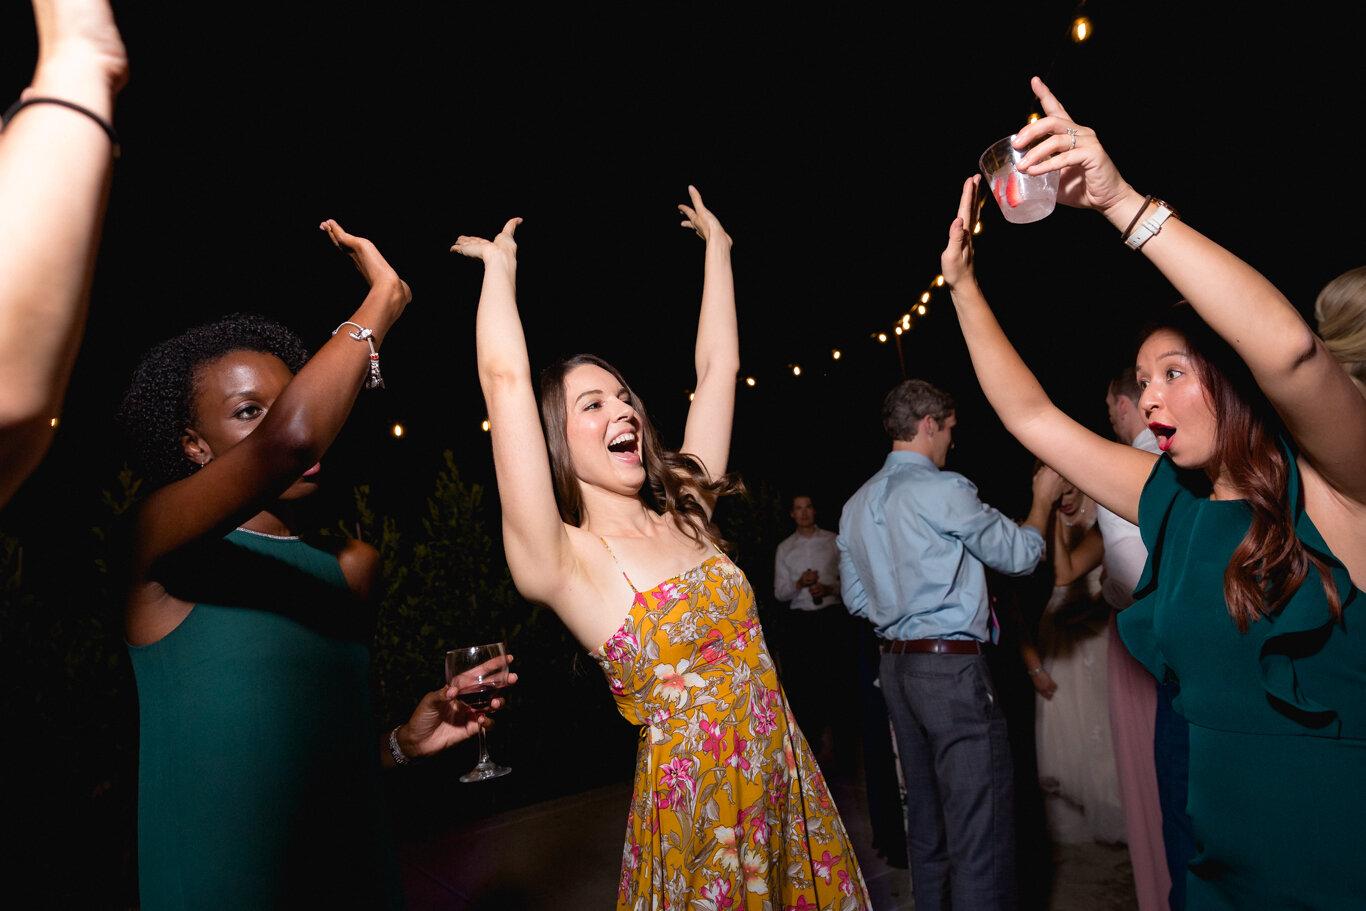 2019.08.24_Emily-Ashir-Wedding-at-the-Maples-6616.jpg